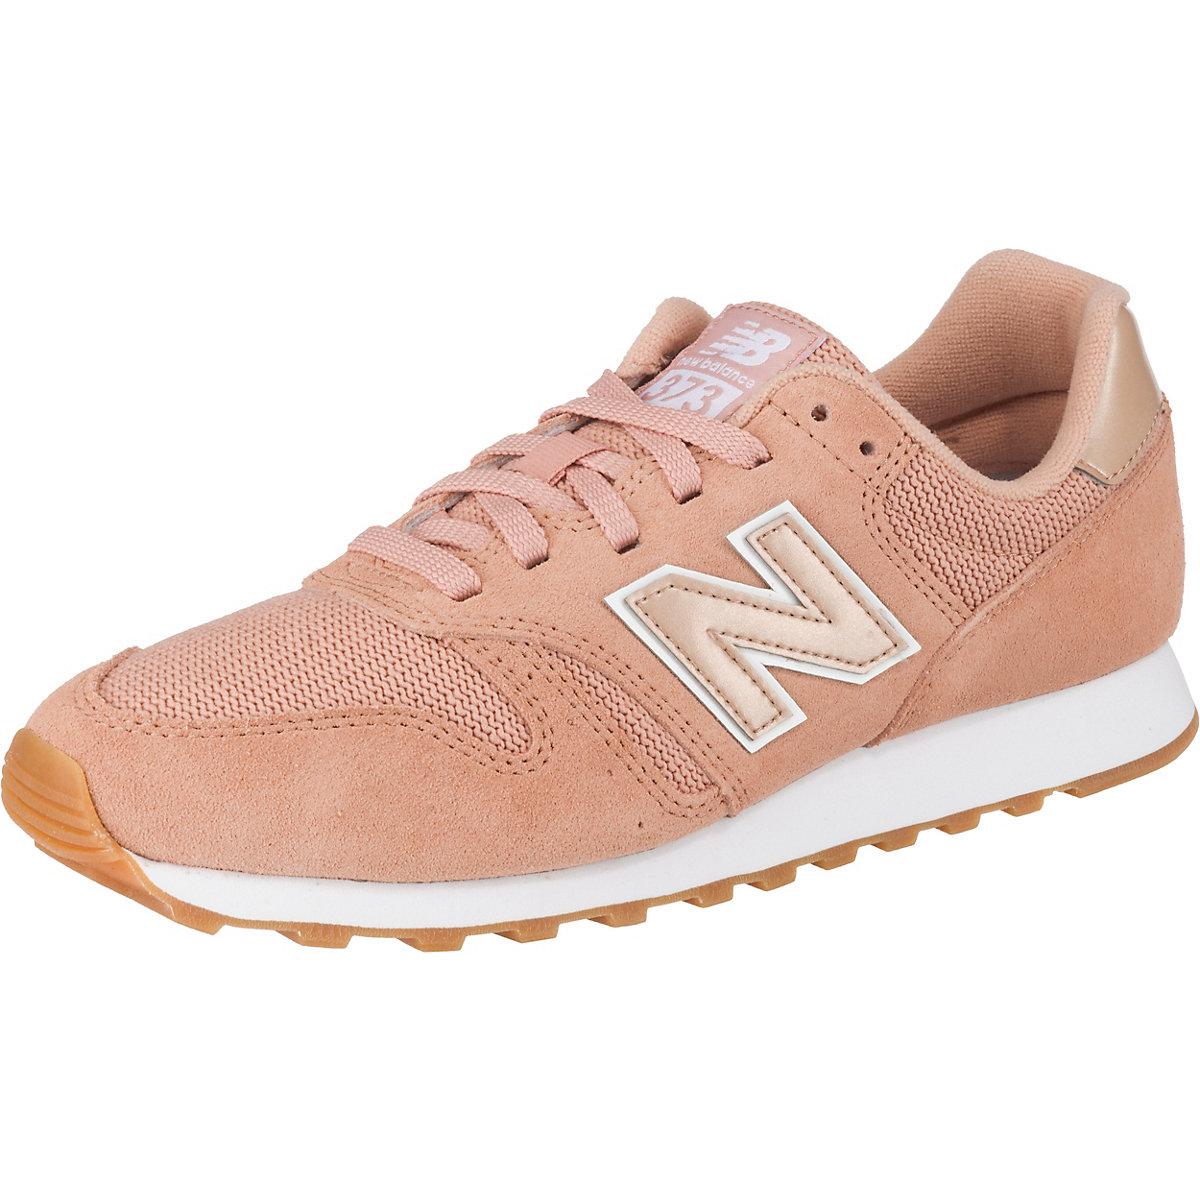 Pink NEW BALANCE Low sneakers WL373 DAMES - Omoda.com